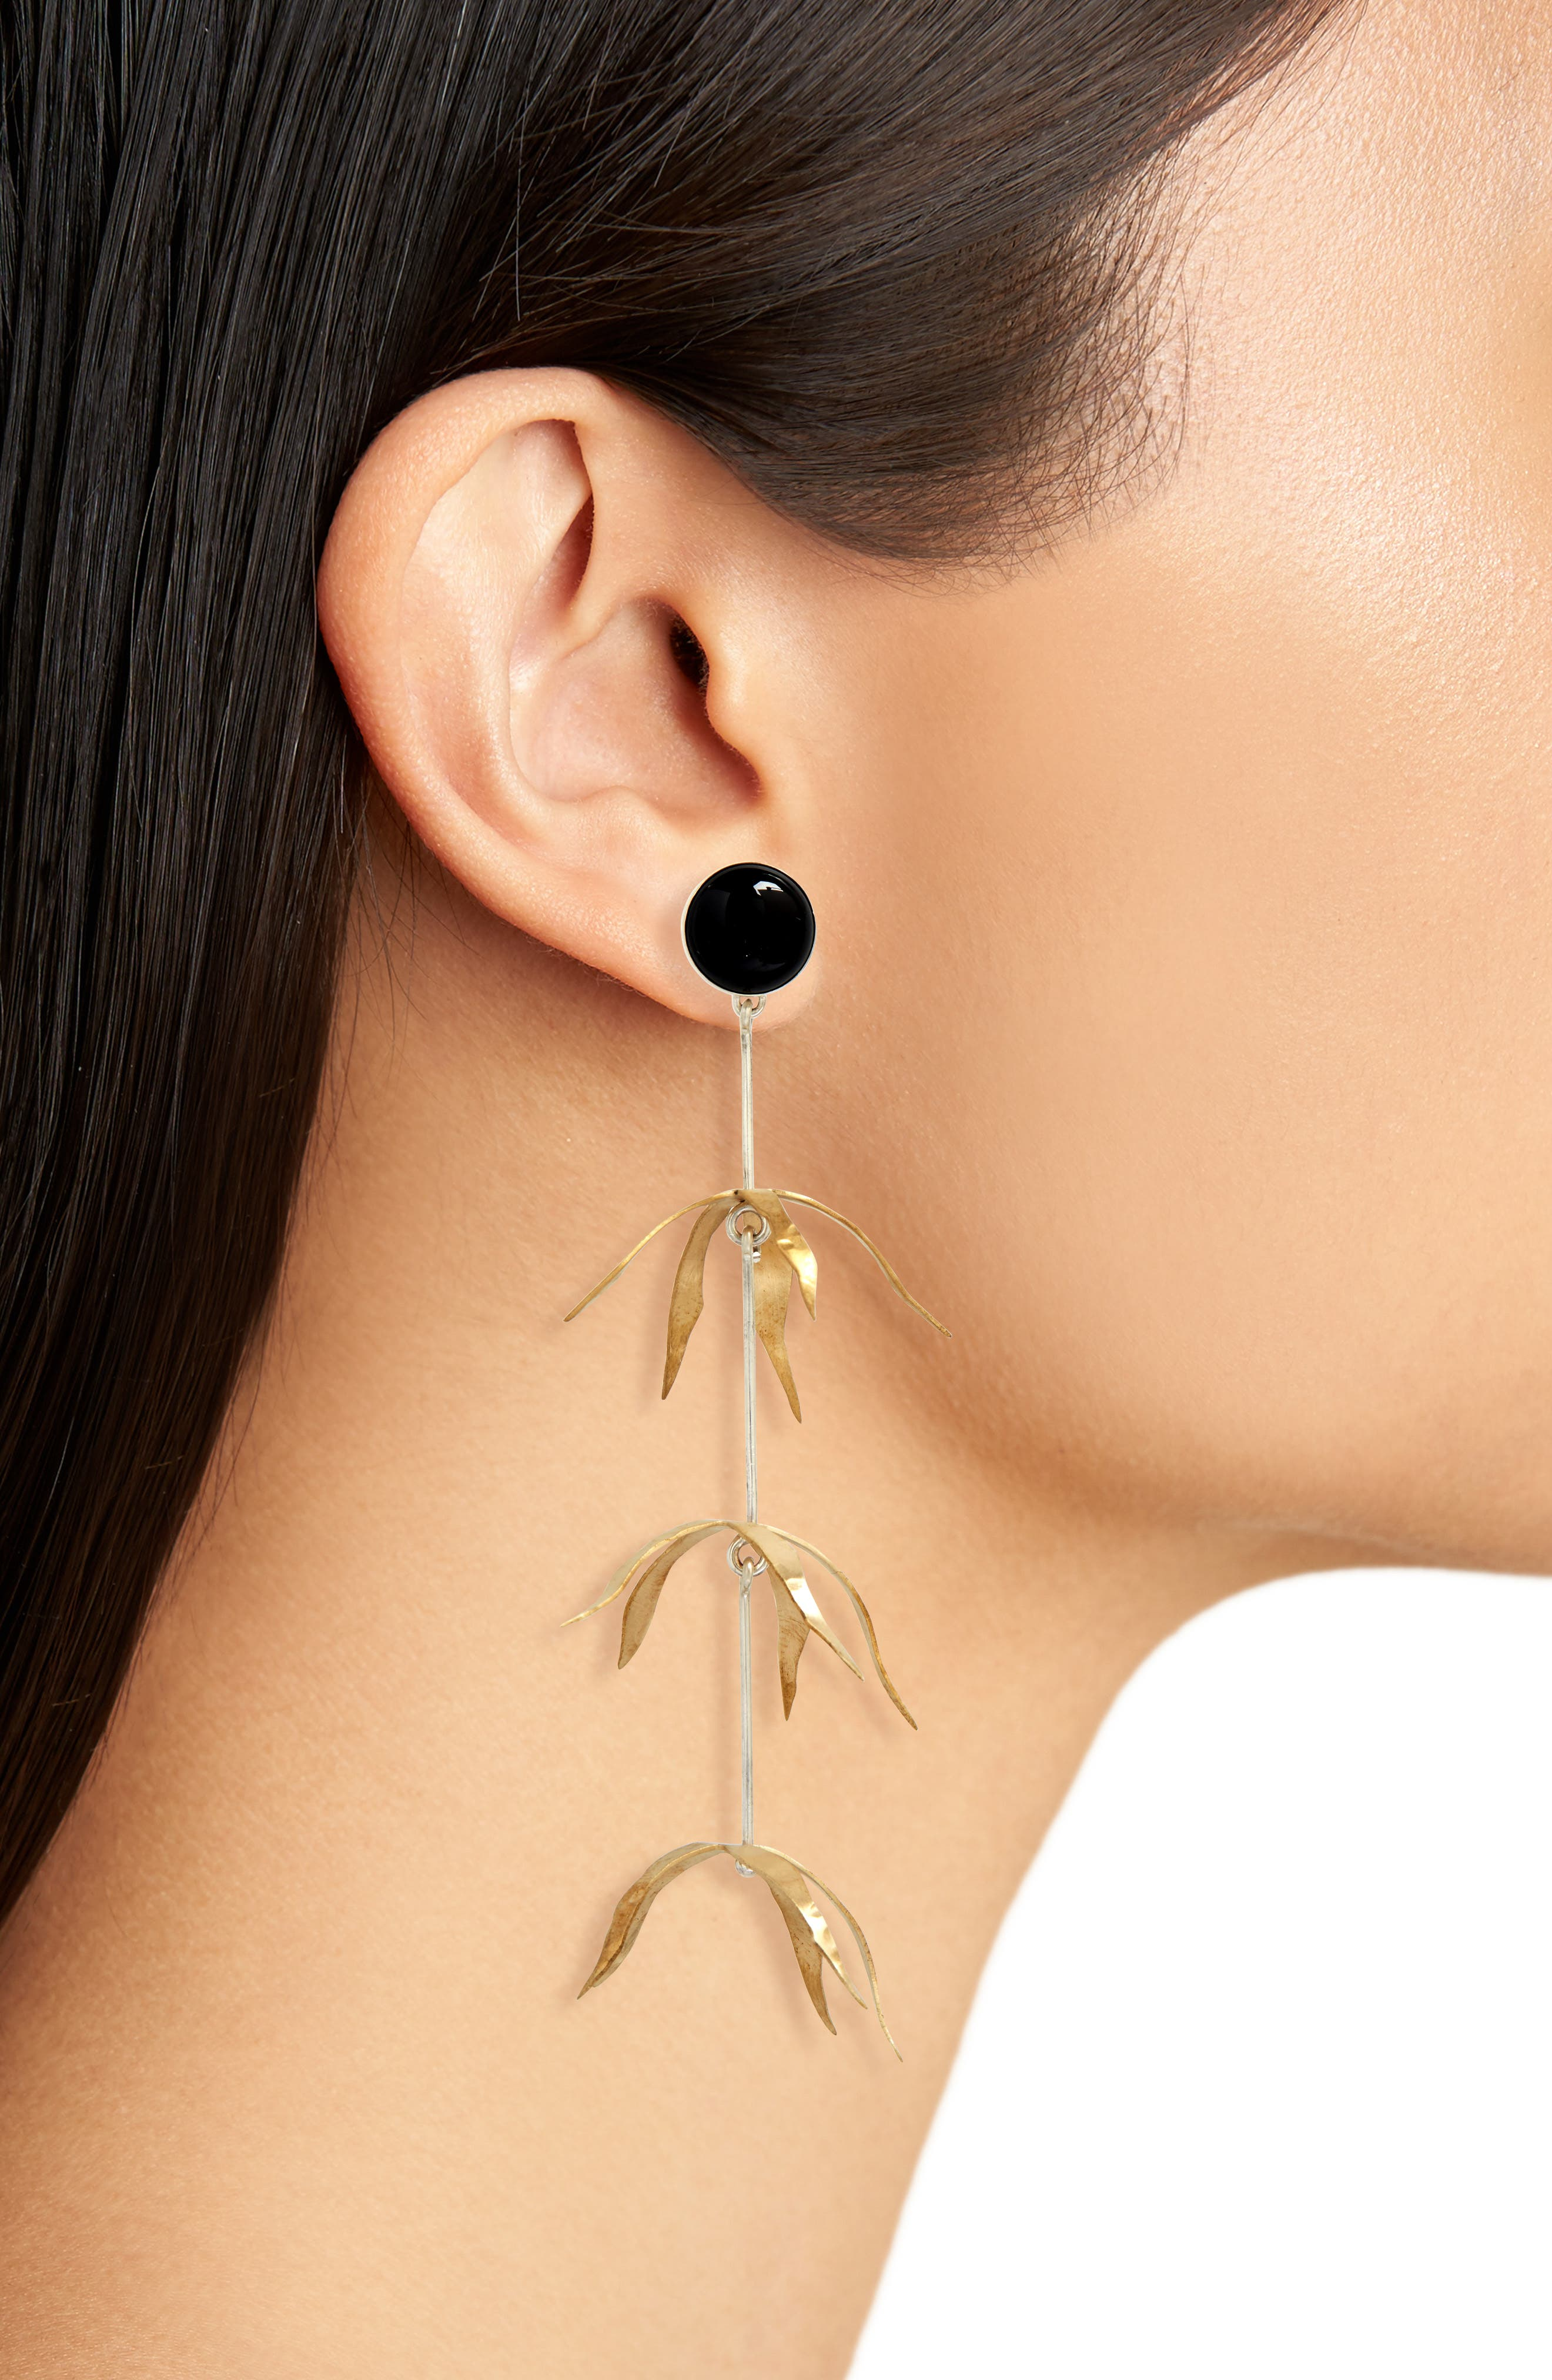 Estra Earrings,                             Alternate thumbnail 2, color,                             Sterling Silver/ Bronze/ Onyx